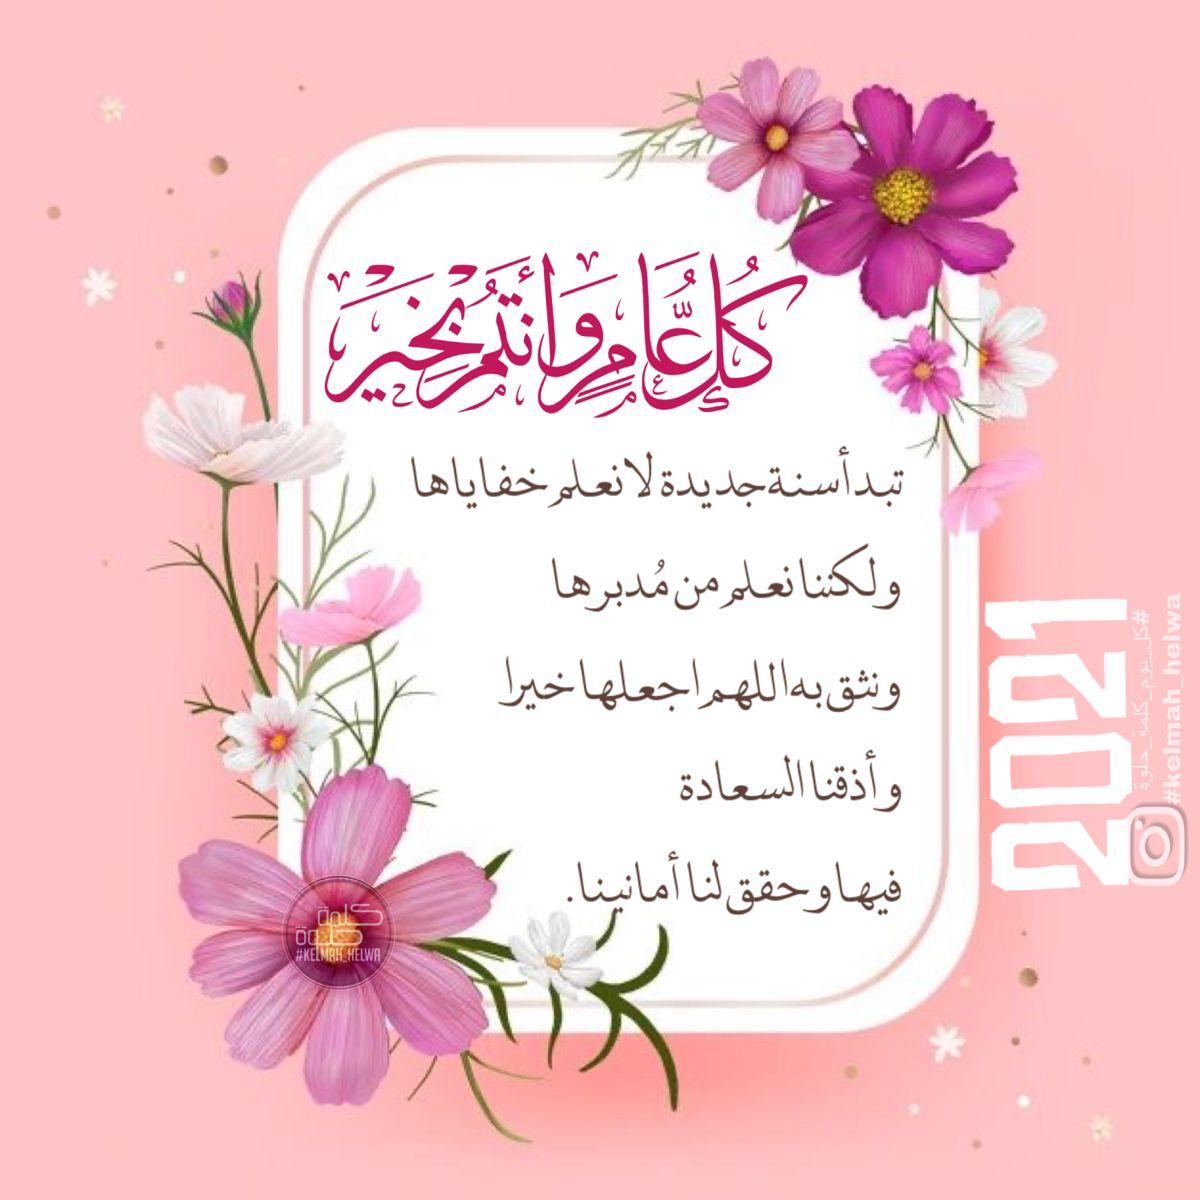 Pin By Kelmah Helwa On العام الجديد Lil